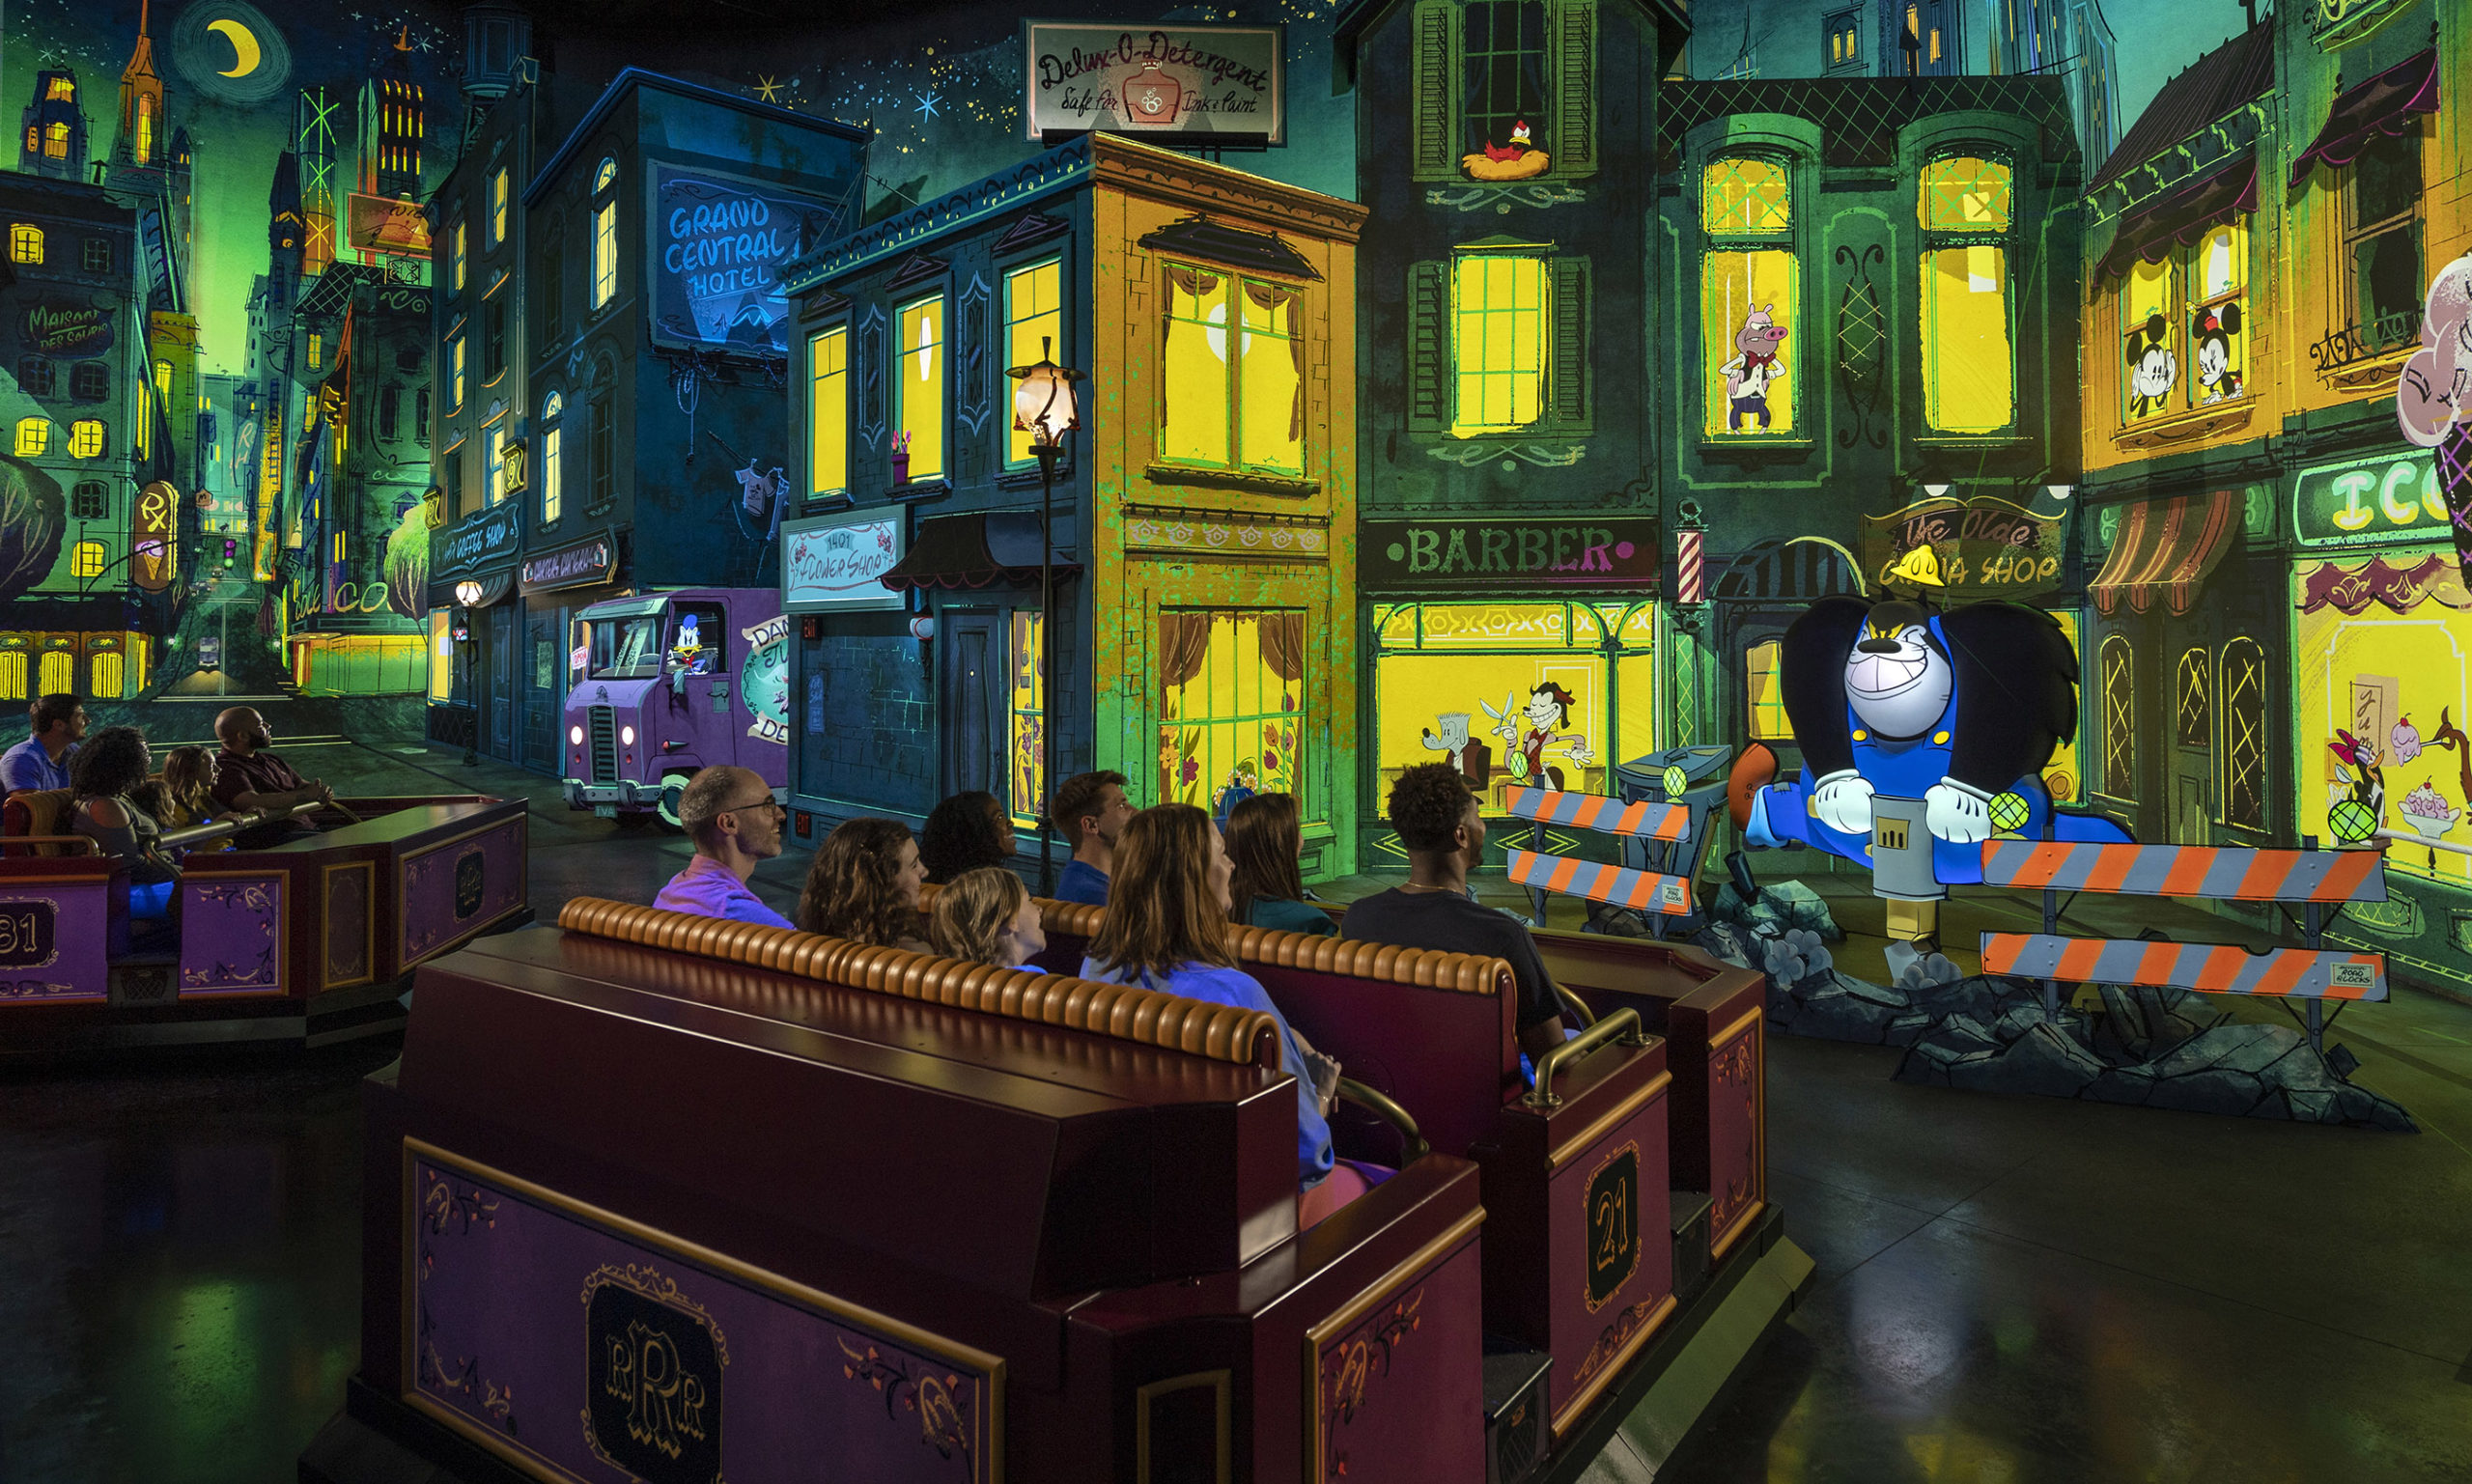 Mickey and Minnie's Runaway Railway pre-show returns at Disney's Hollywood Studios